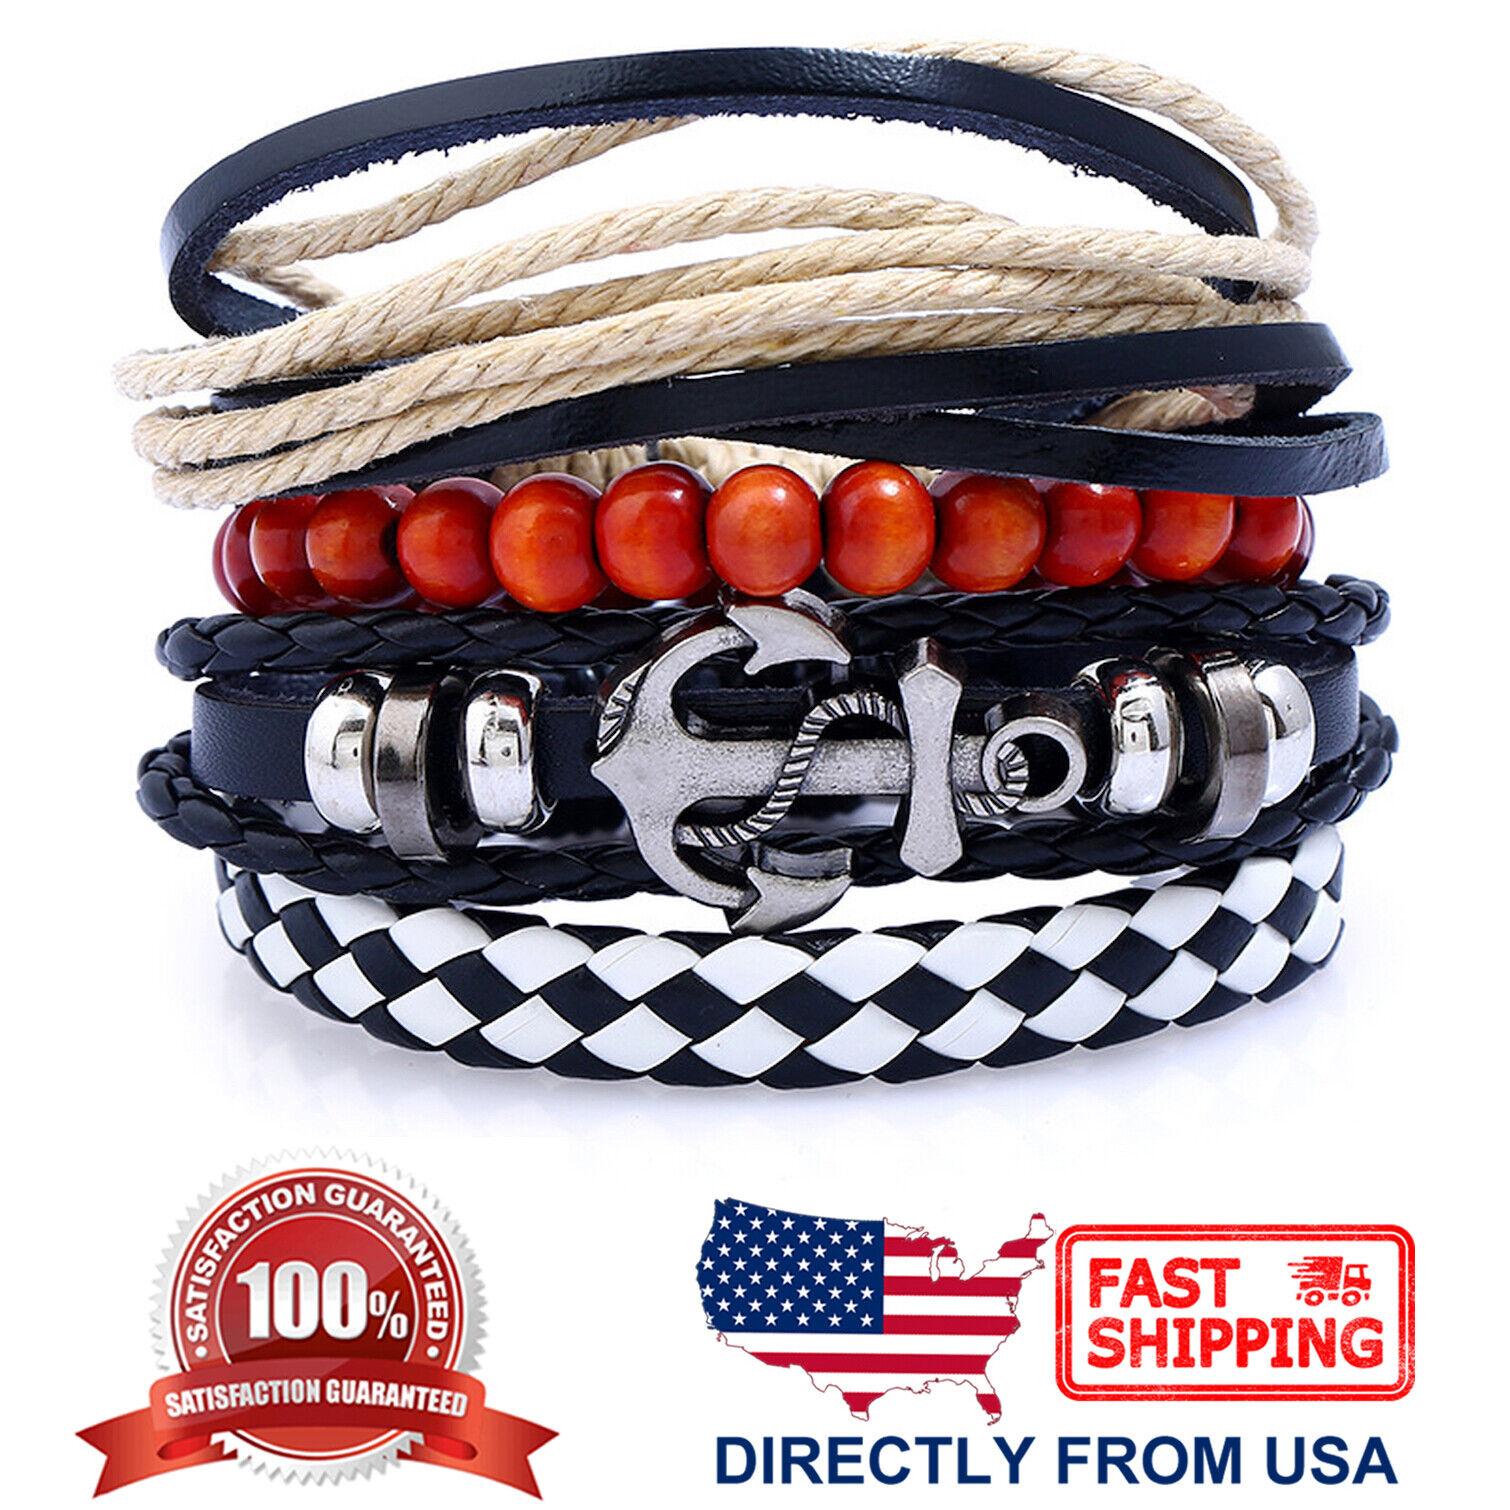 Anchor Tribal Wood Beads Rope Leather Wristband Mens Womens Bracelet 4pcs Set Bracelets